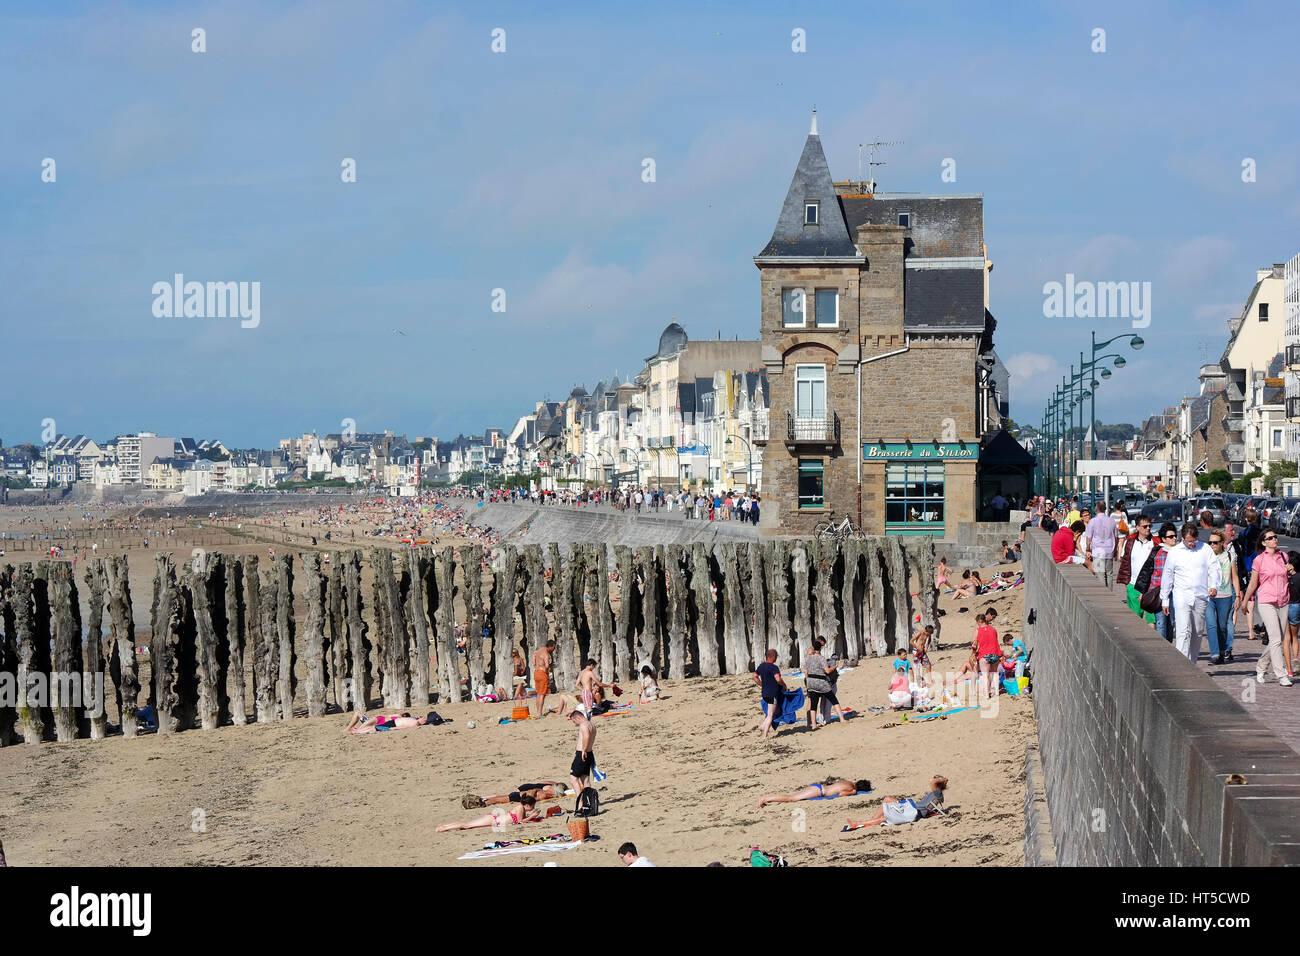 Saint Malo beach and Boulevard, Ille et Vilaine, France - Stock Image